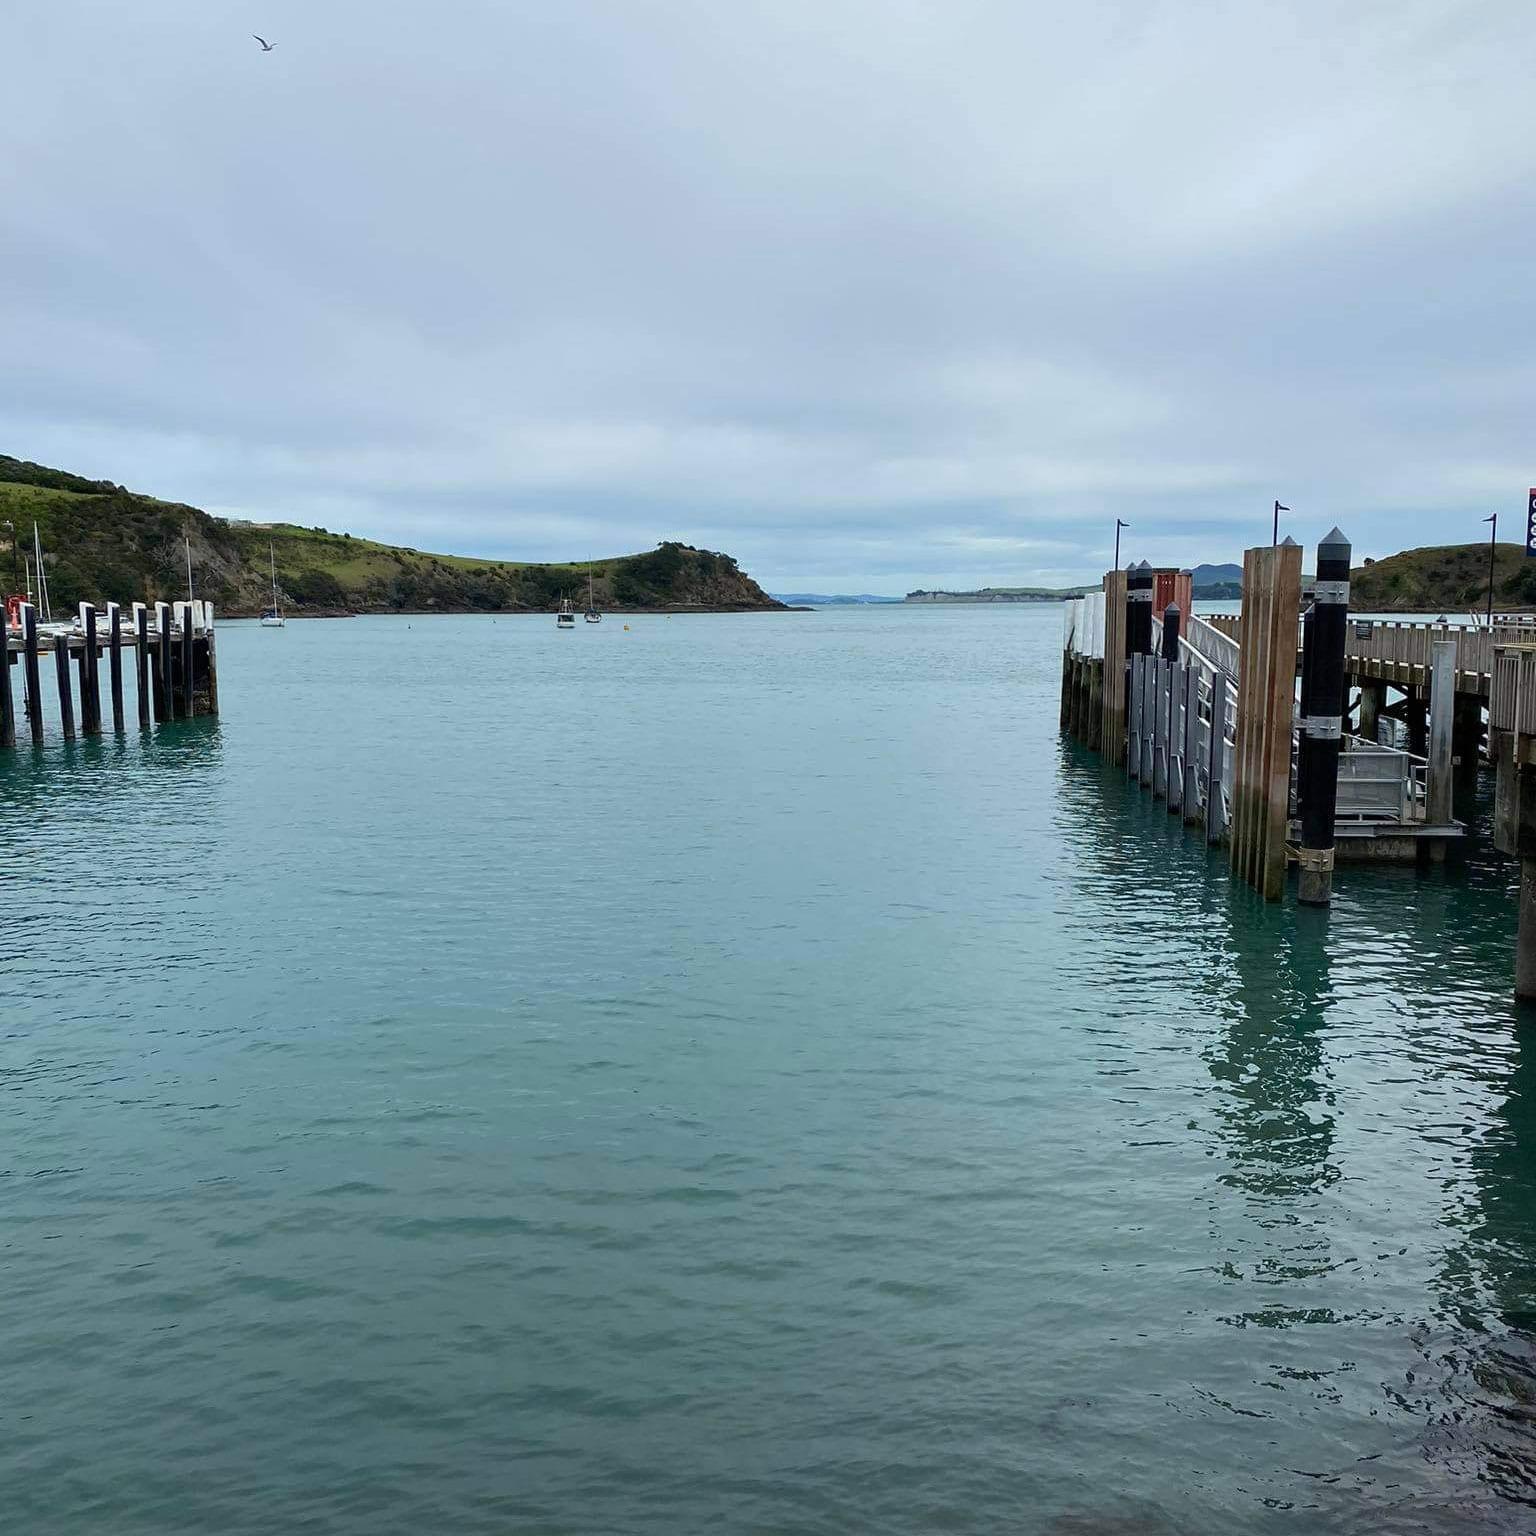 Still harbour water between two jetties beneath a moody grey sky